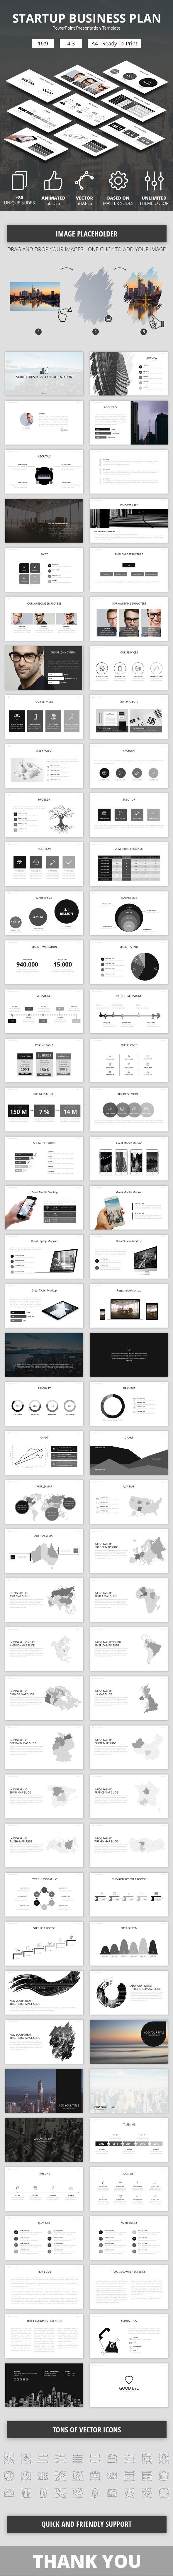 Startup Business Plan PowerPoint Presenation Template - Business PowerPoint Templates